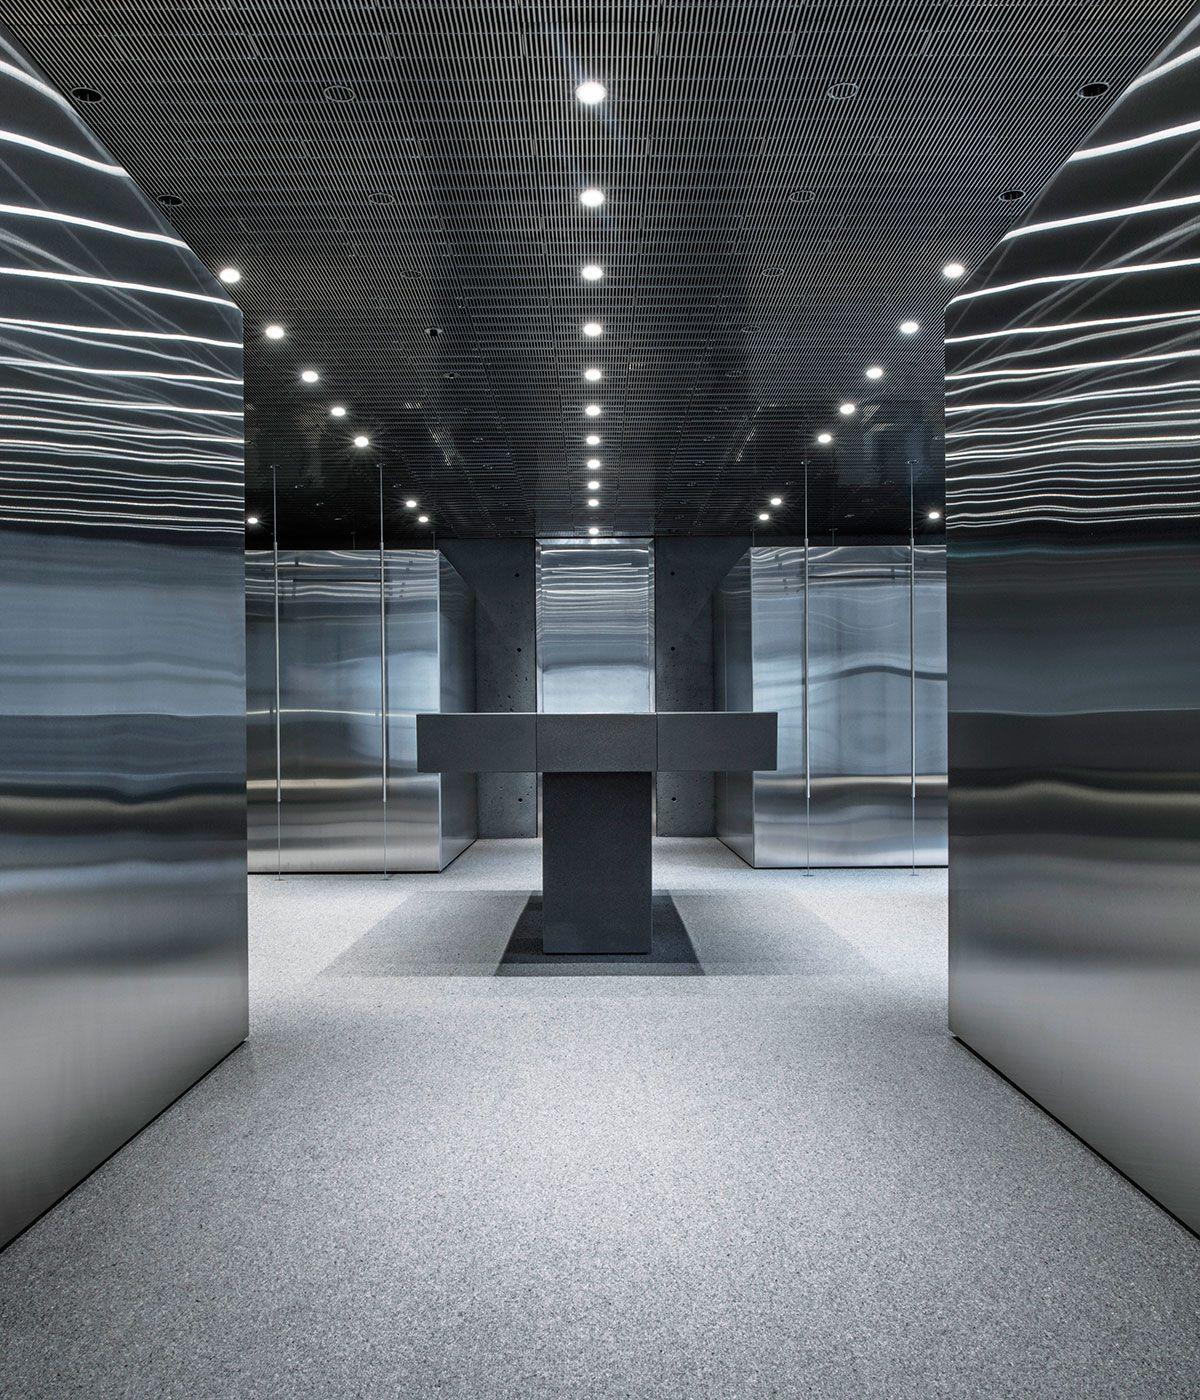 David Chipperfield Designs Ssense S First Flagship Store Boutique Interior Design Minimalist